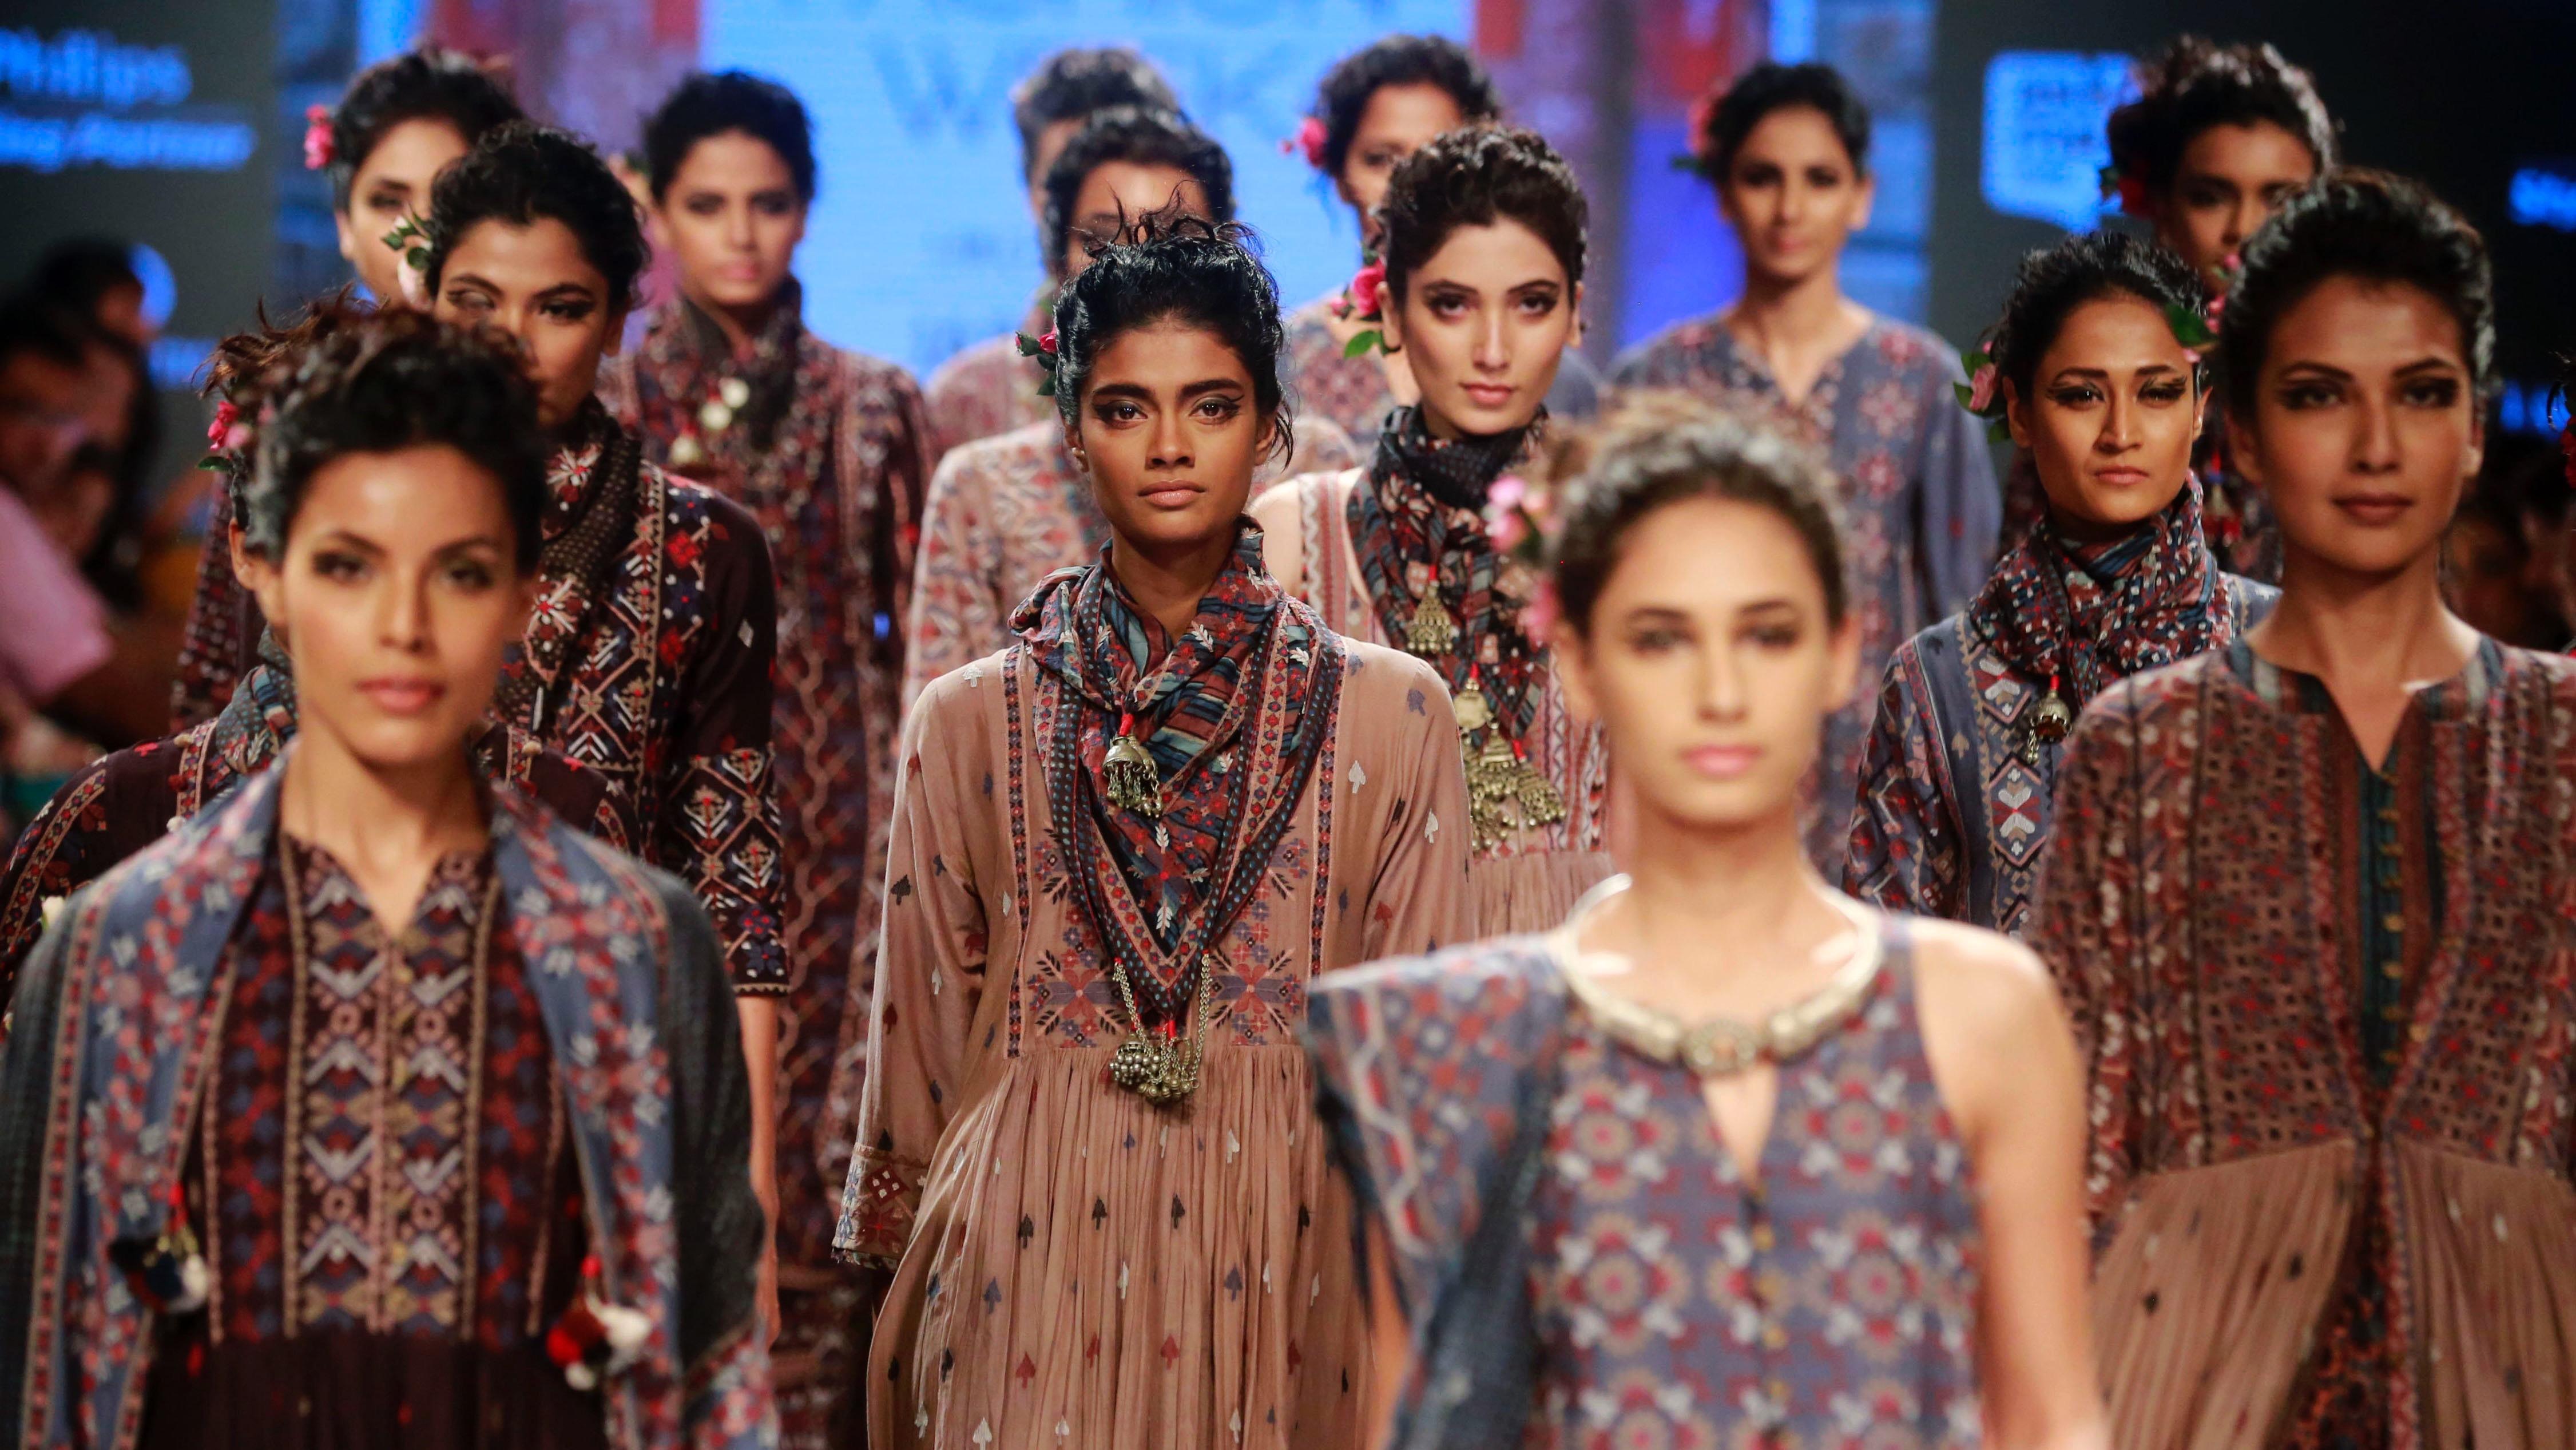 Indian models display creations by designer Rahul and Shikha during the Lakme Fashion Week in Mumbai, India, Thursday, Aug. 27, 2015. (AP Photo/Rafiq Maqbool)